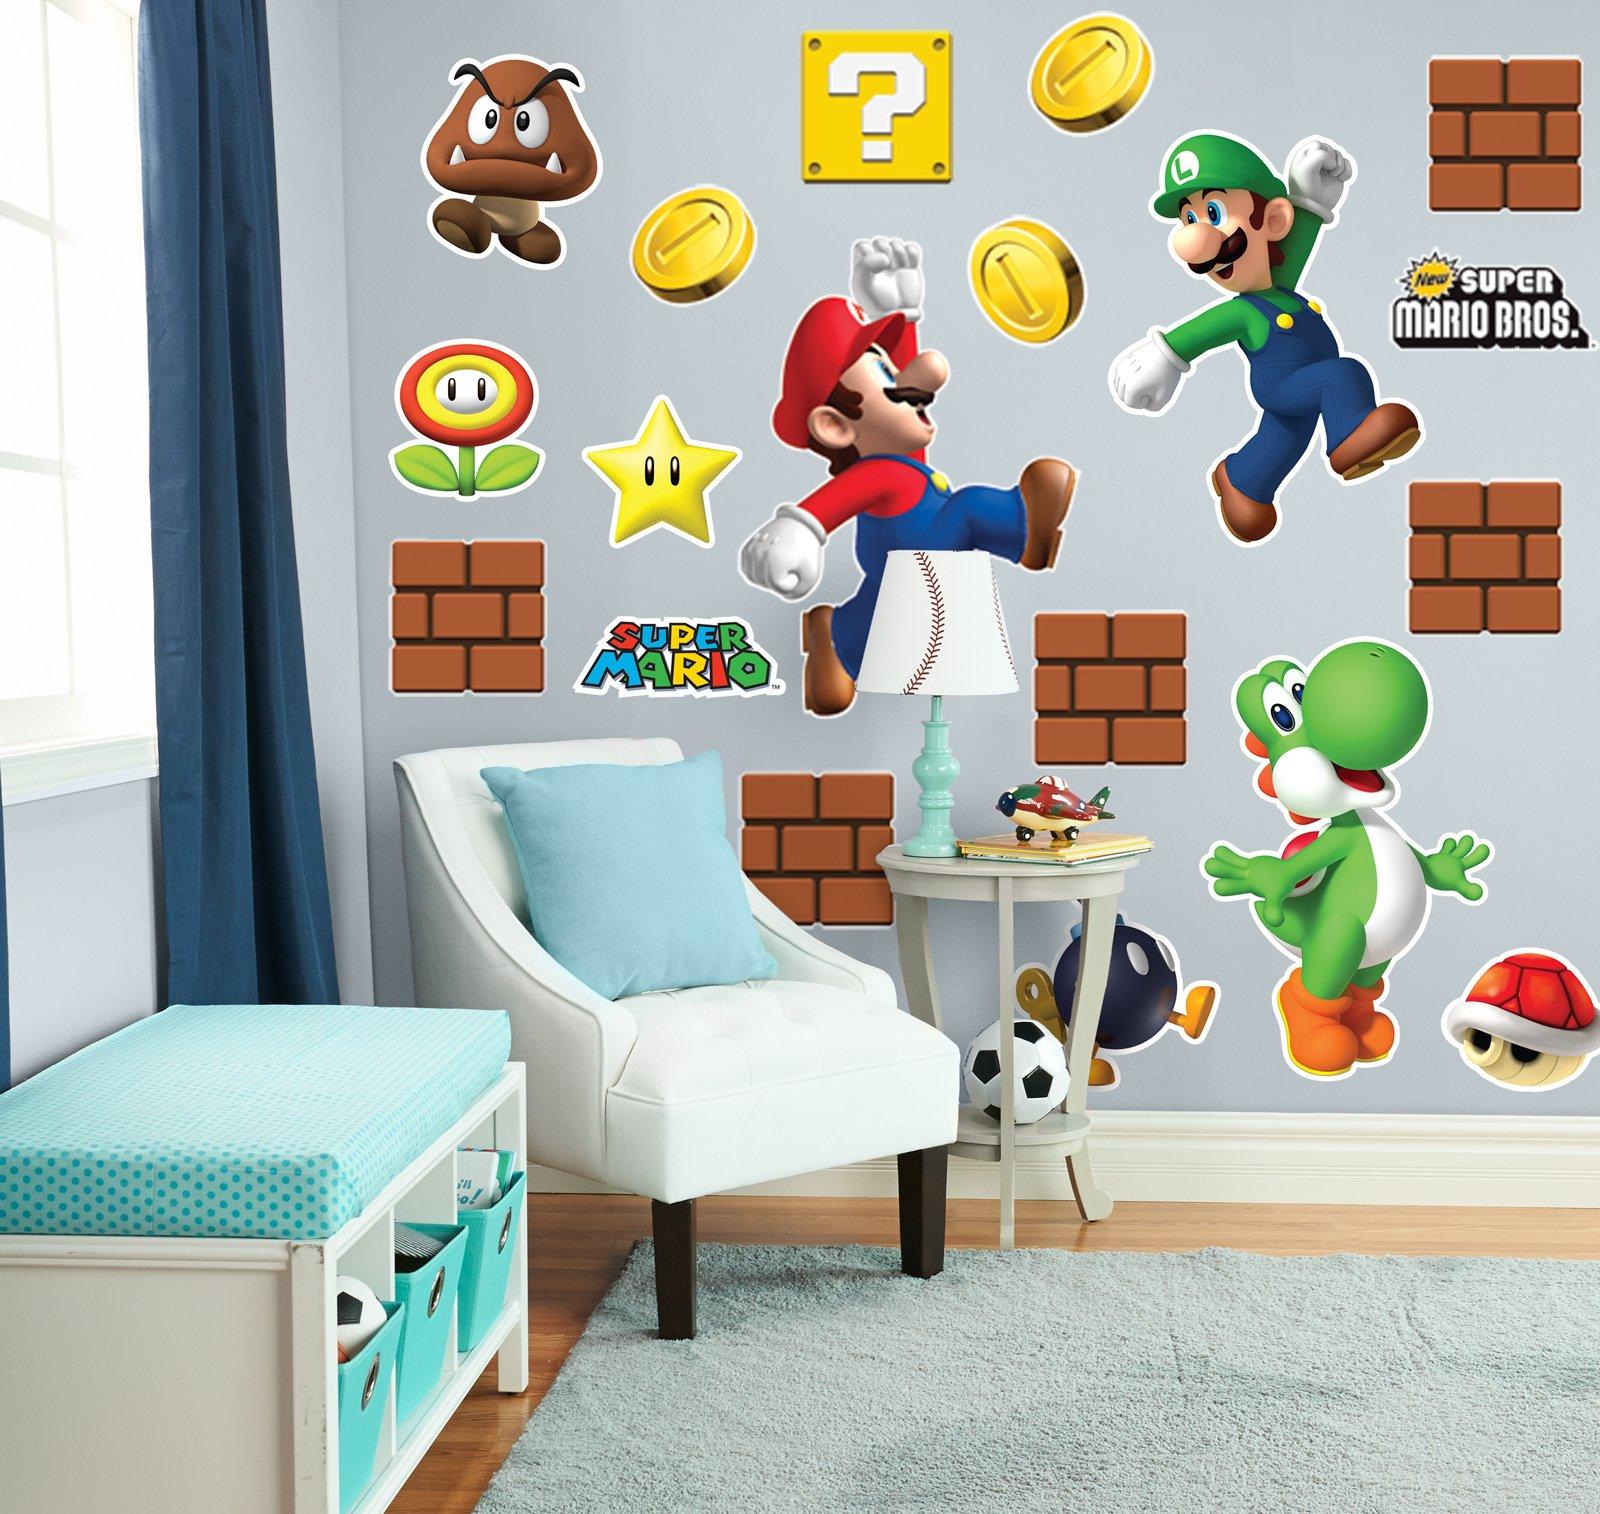 BirthdayExpress Super Mario Bros Room Decor - Giant Wall Decals Combo Kit